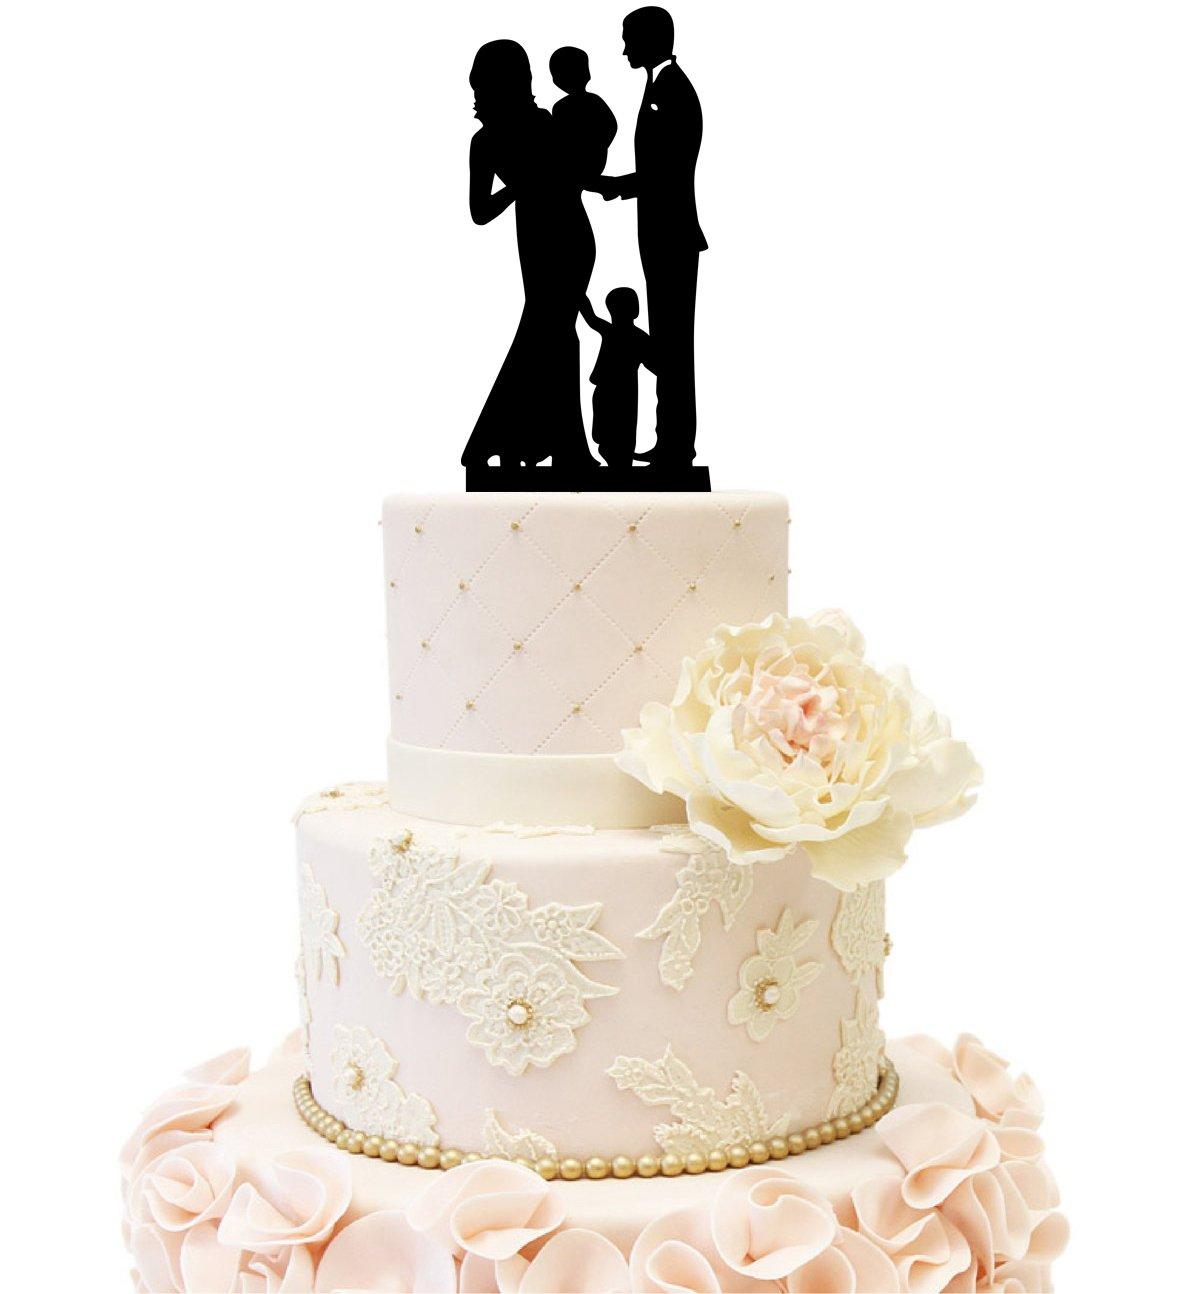 Amazon.com: Wedding Anniversary Family Cake Topper Bride Groom ...